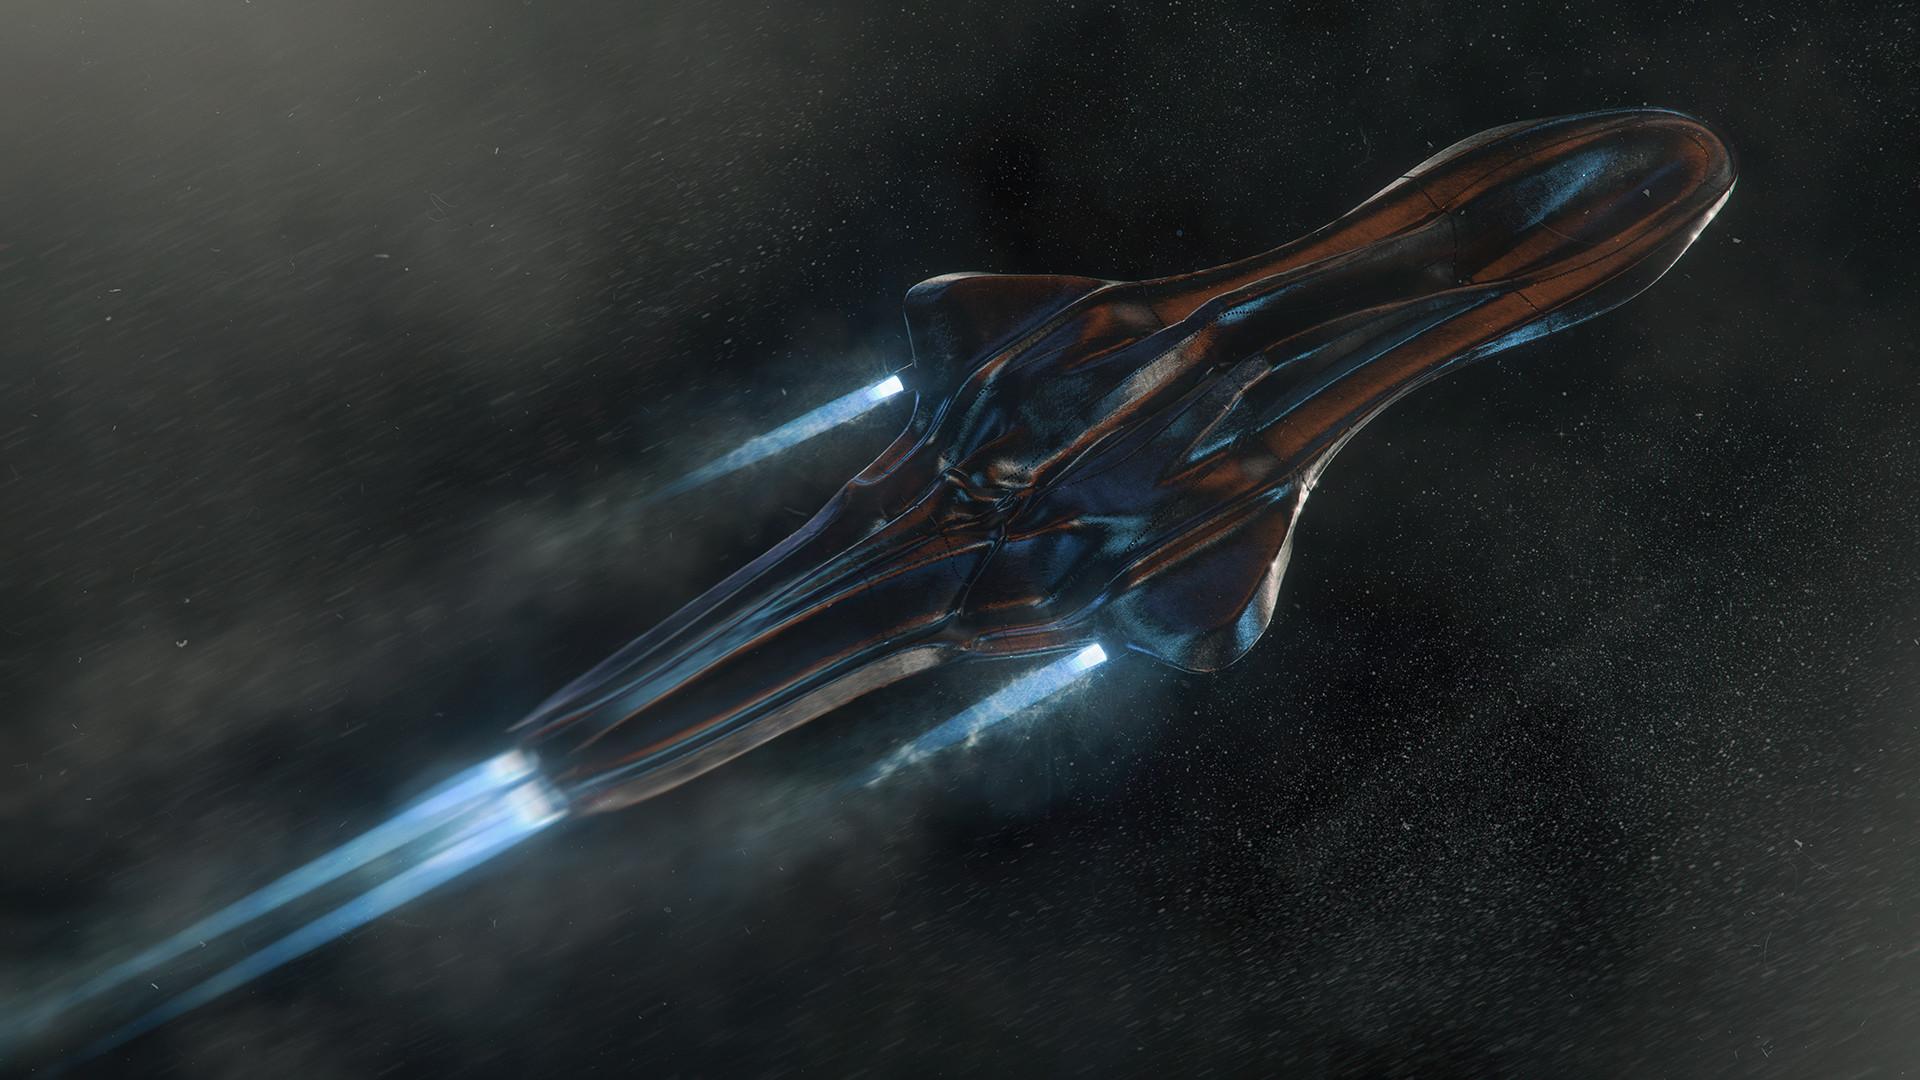 Kresimir jelusic 133 19 02 16 speeder